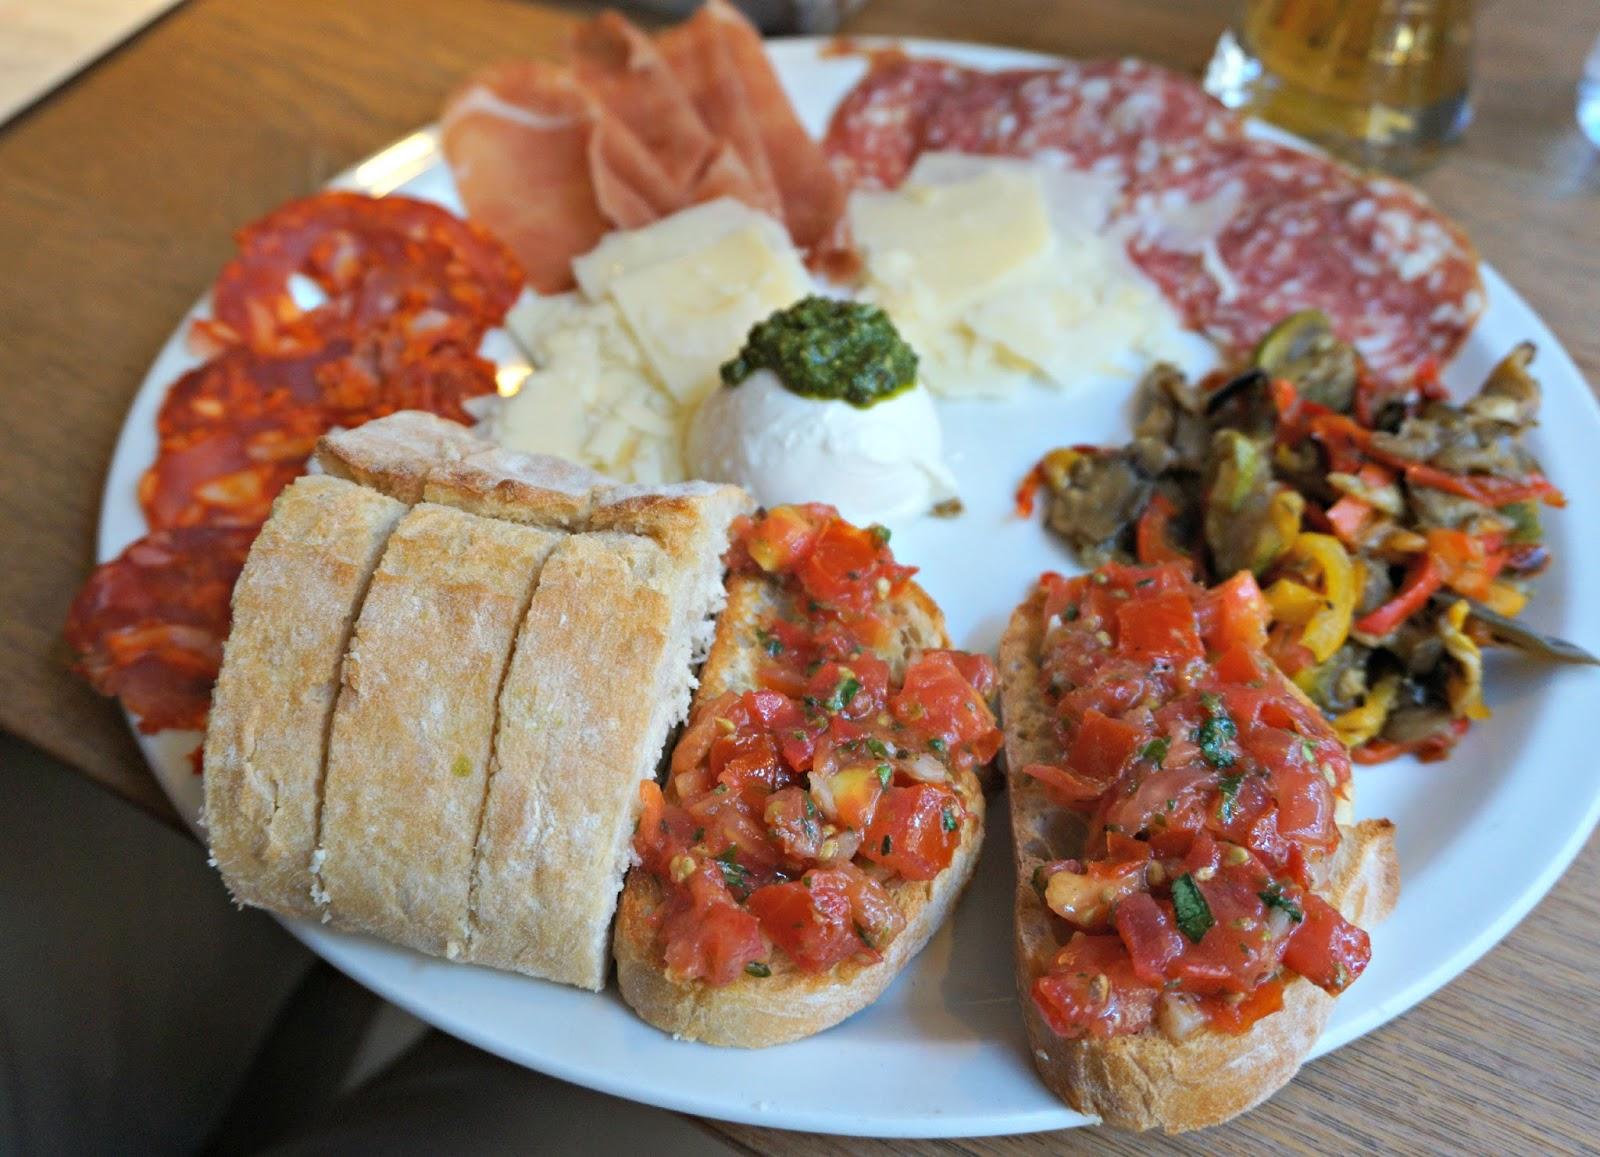 Salami platter at vapiano